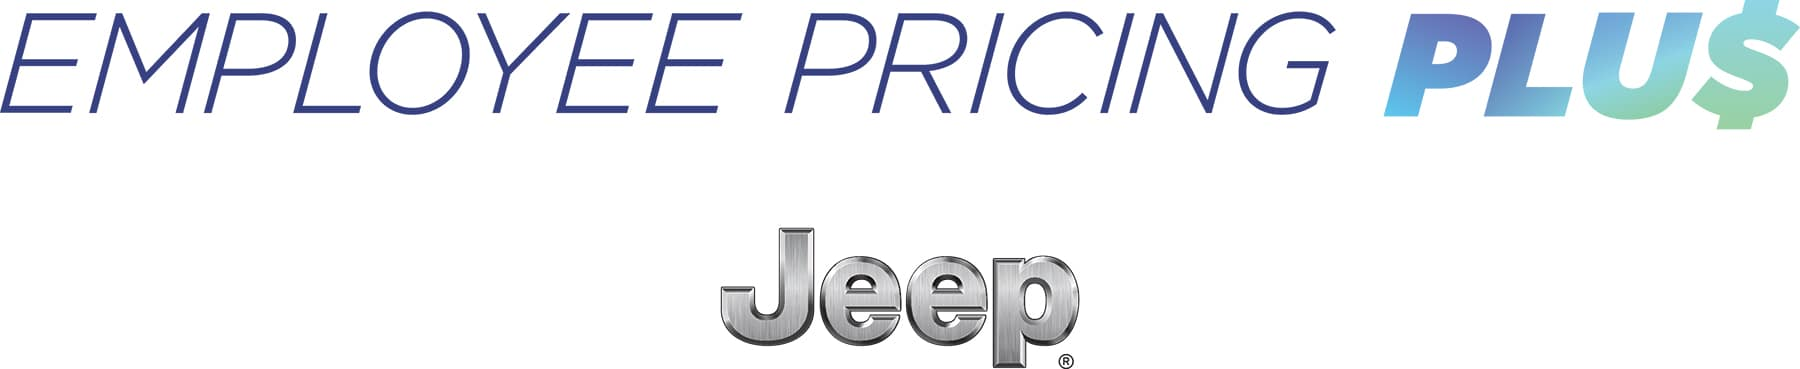 JeepEmployeePricingPlus